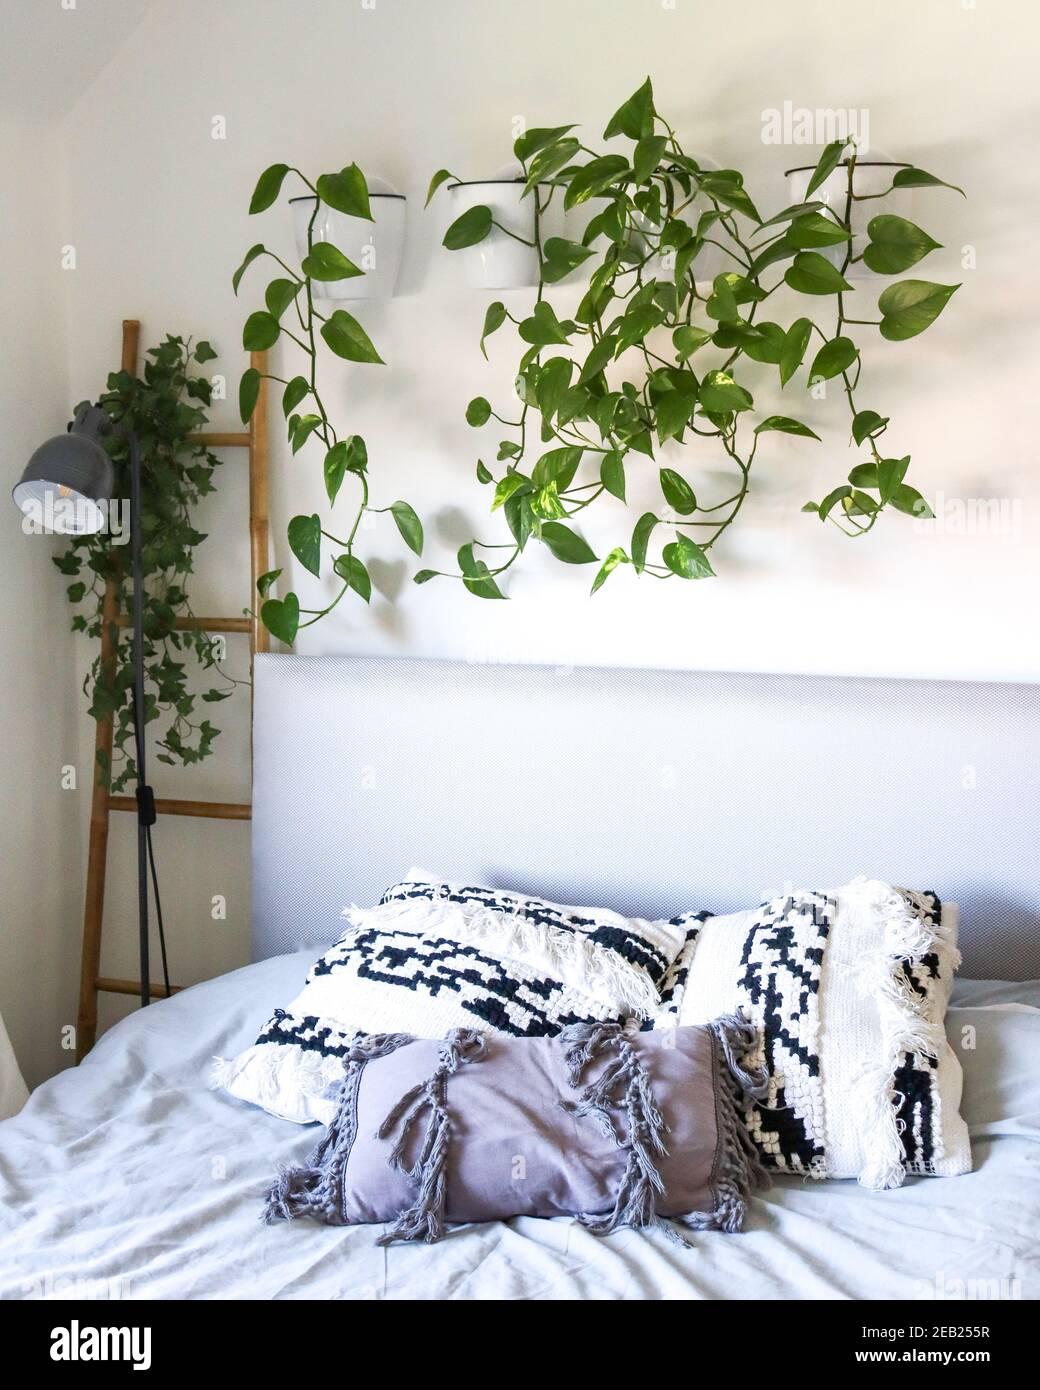 Devils Ivy hanging above bed in wall pot planter, Scandinavian ...